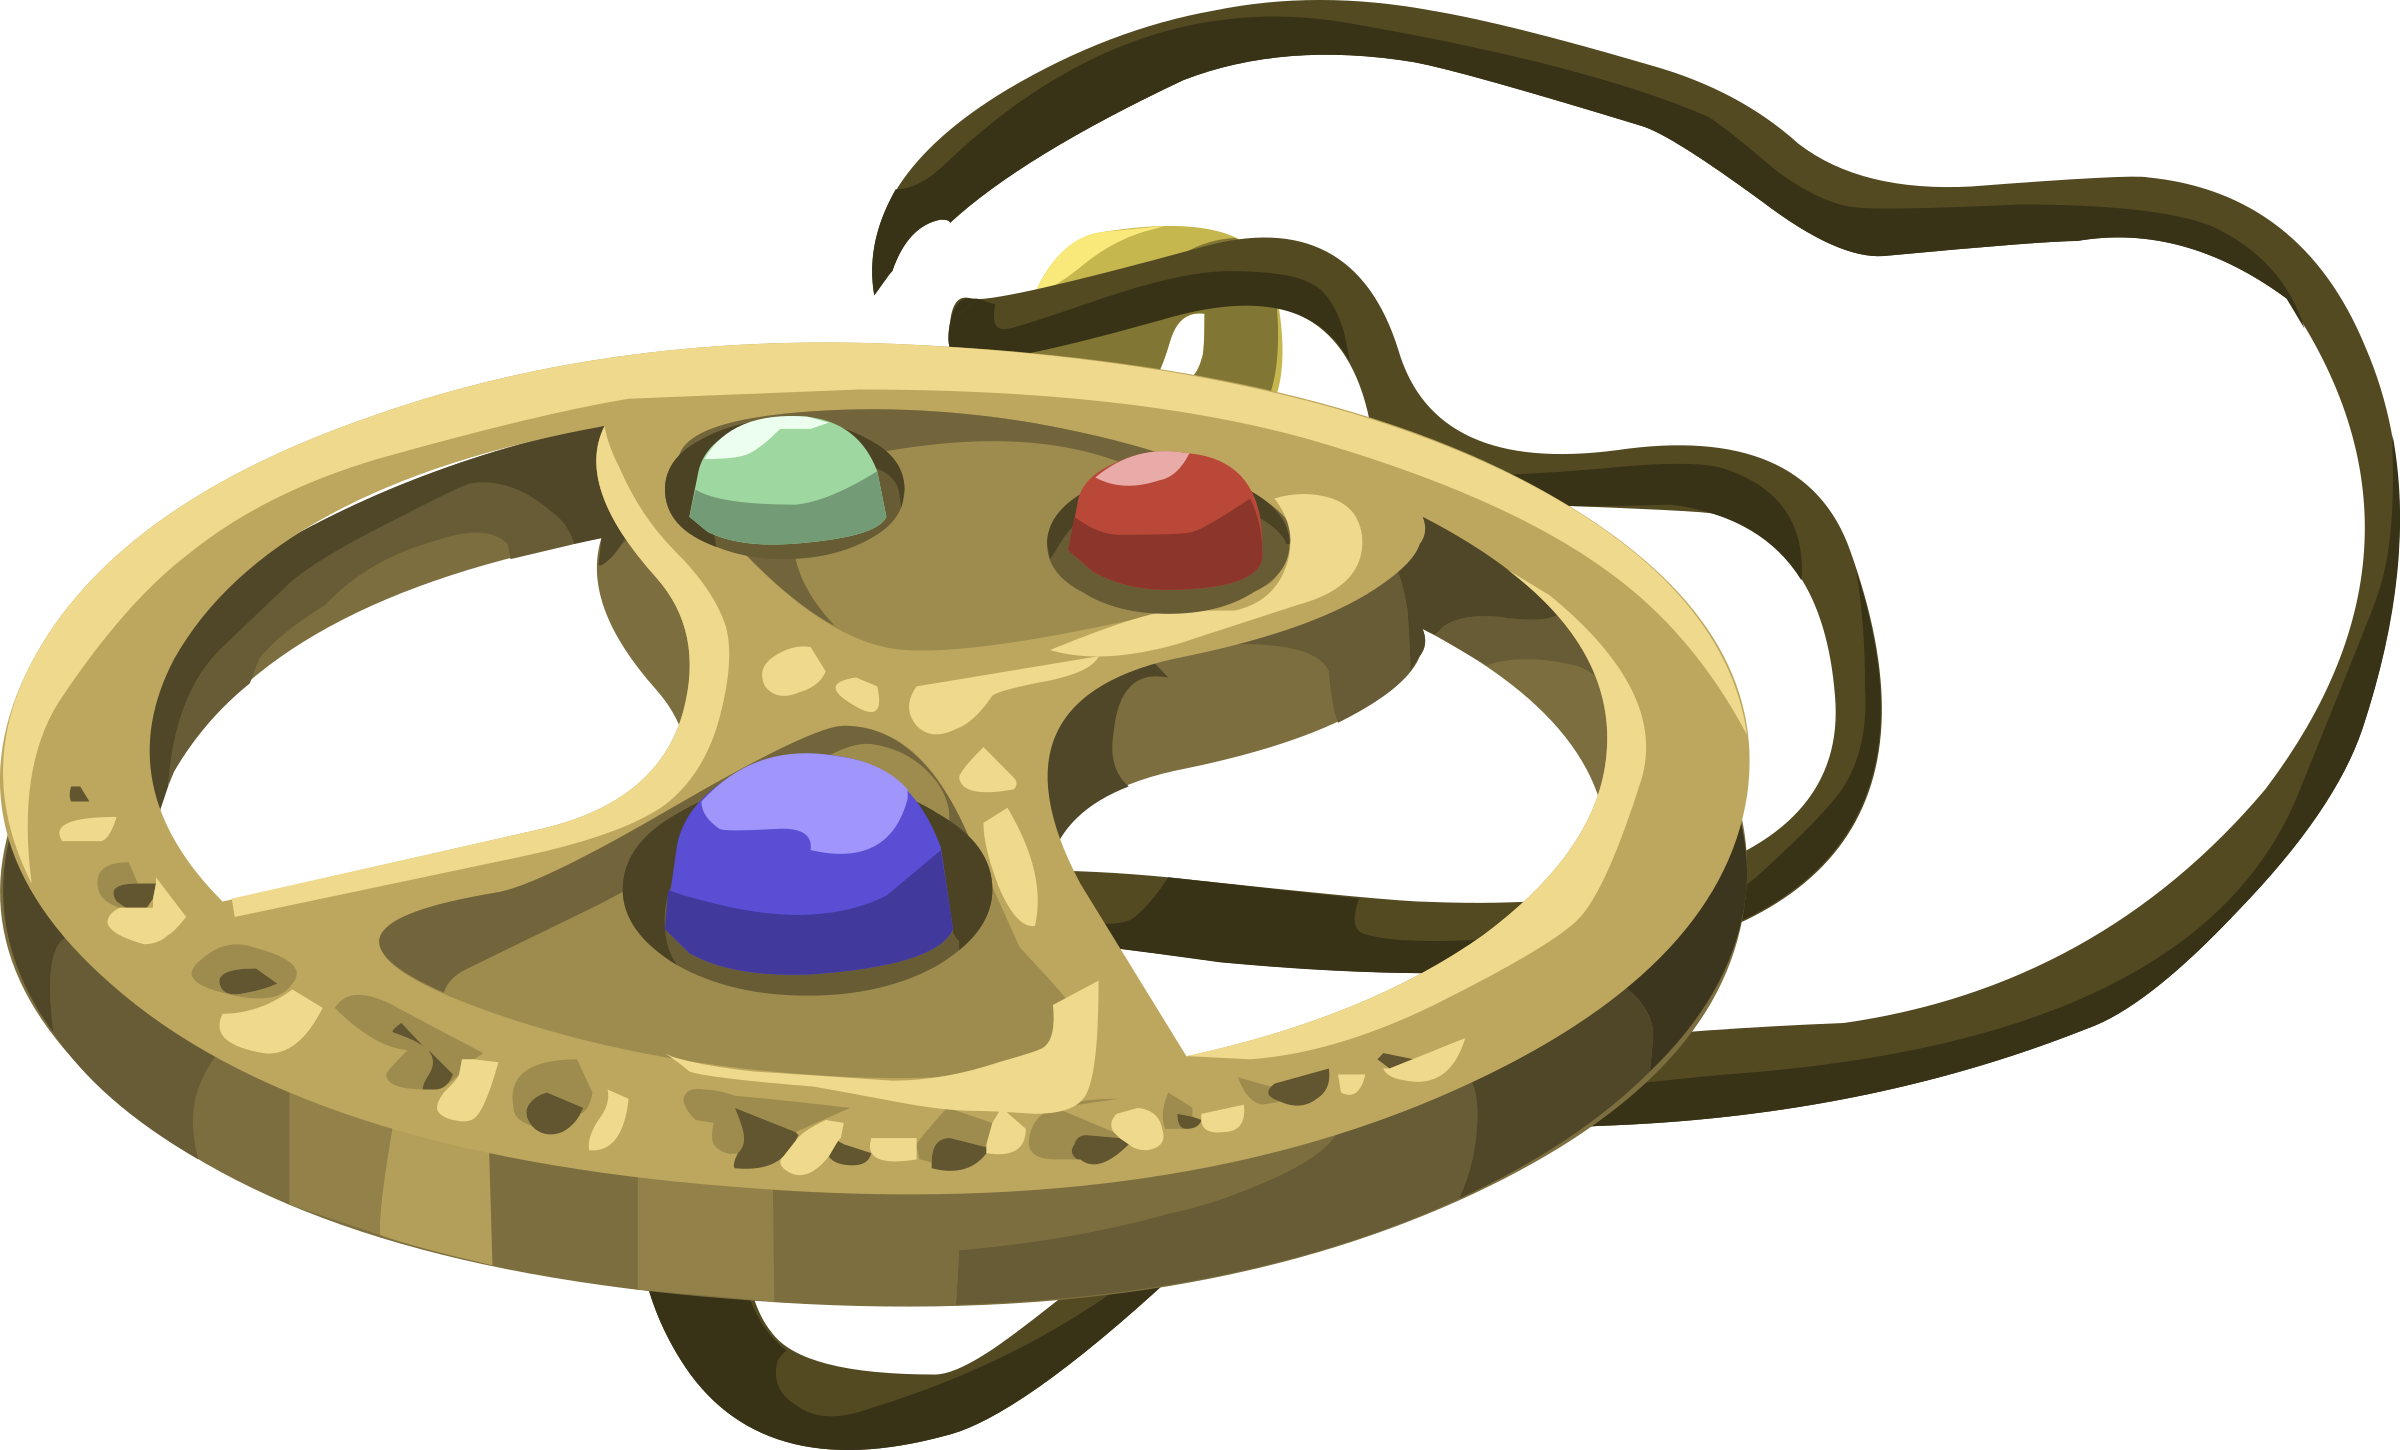 Magic clipart vector png. Artifact magical pendant icons